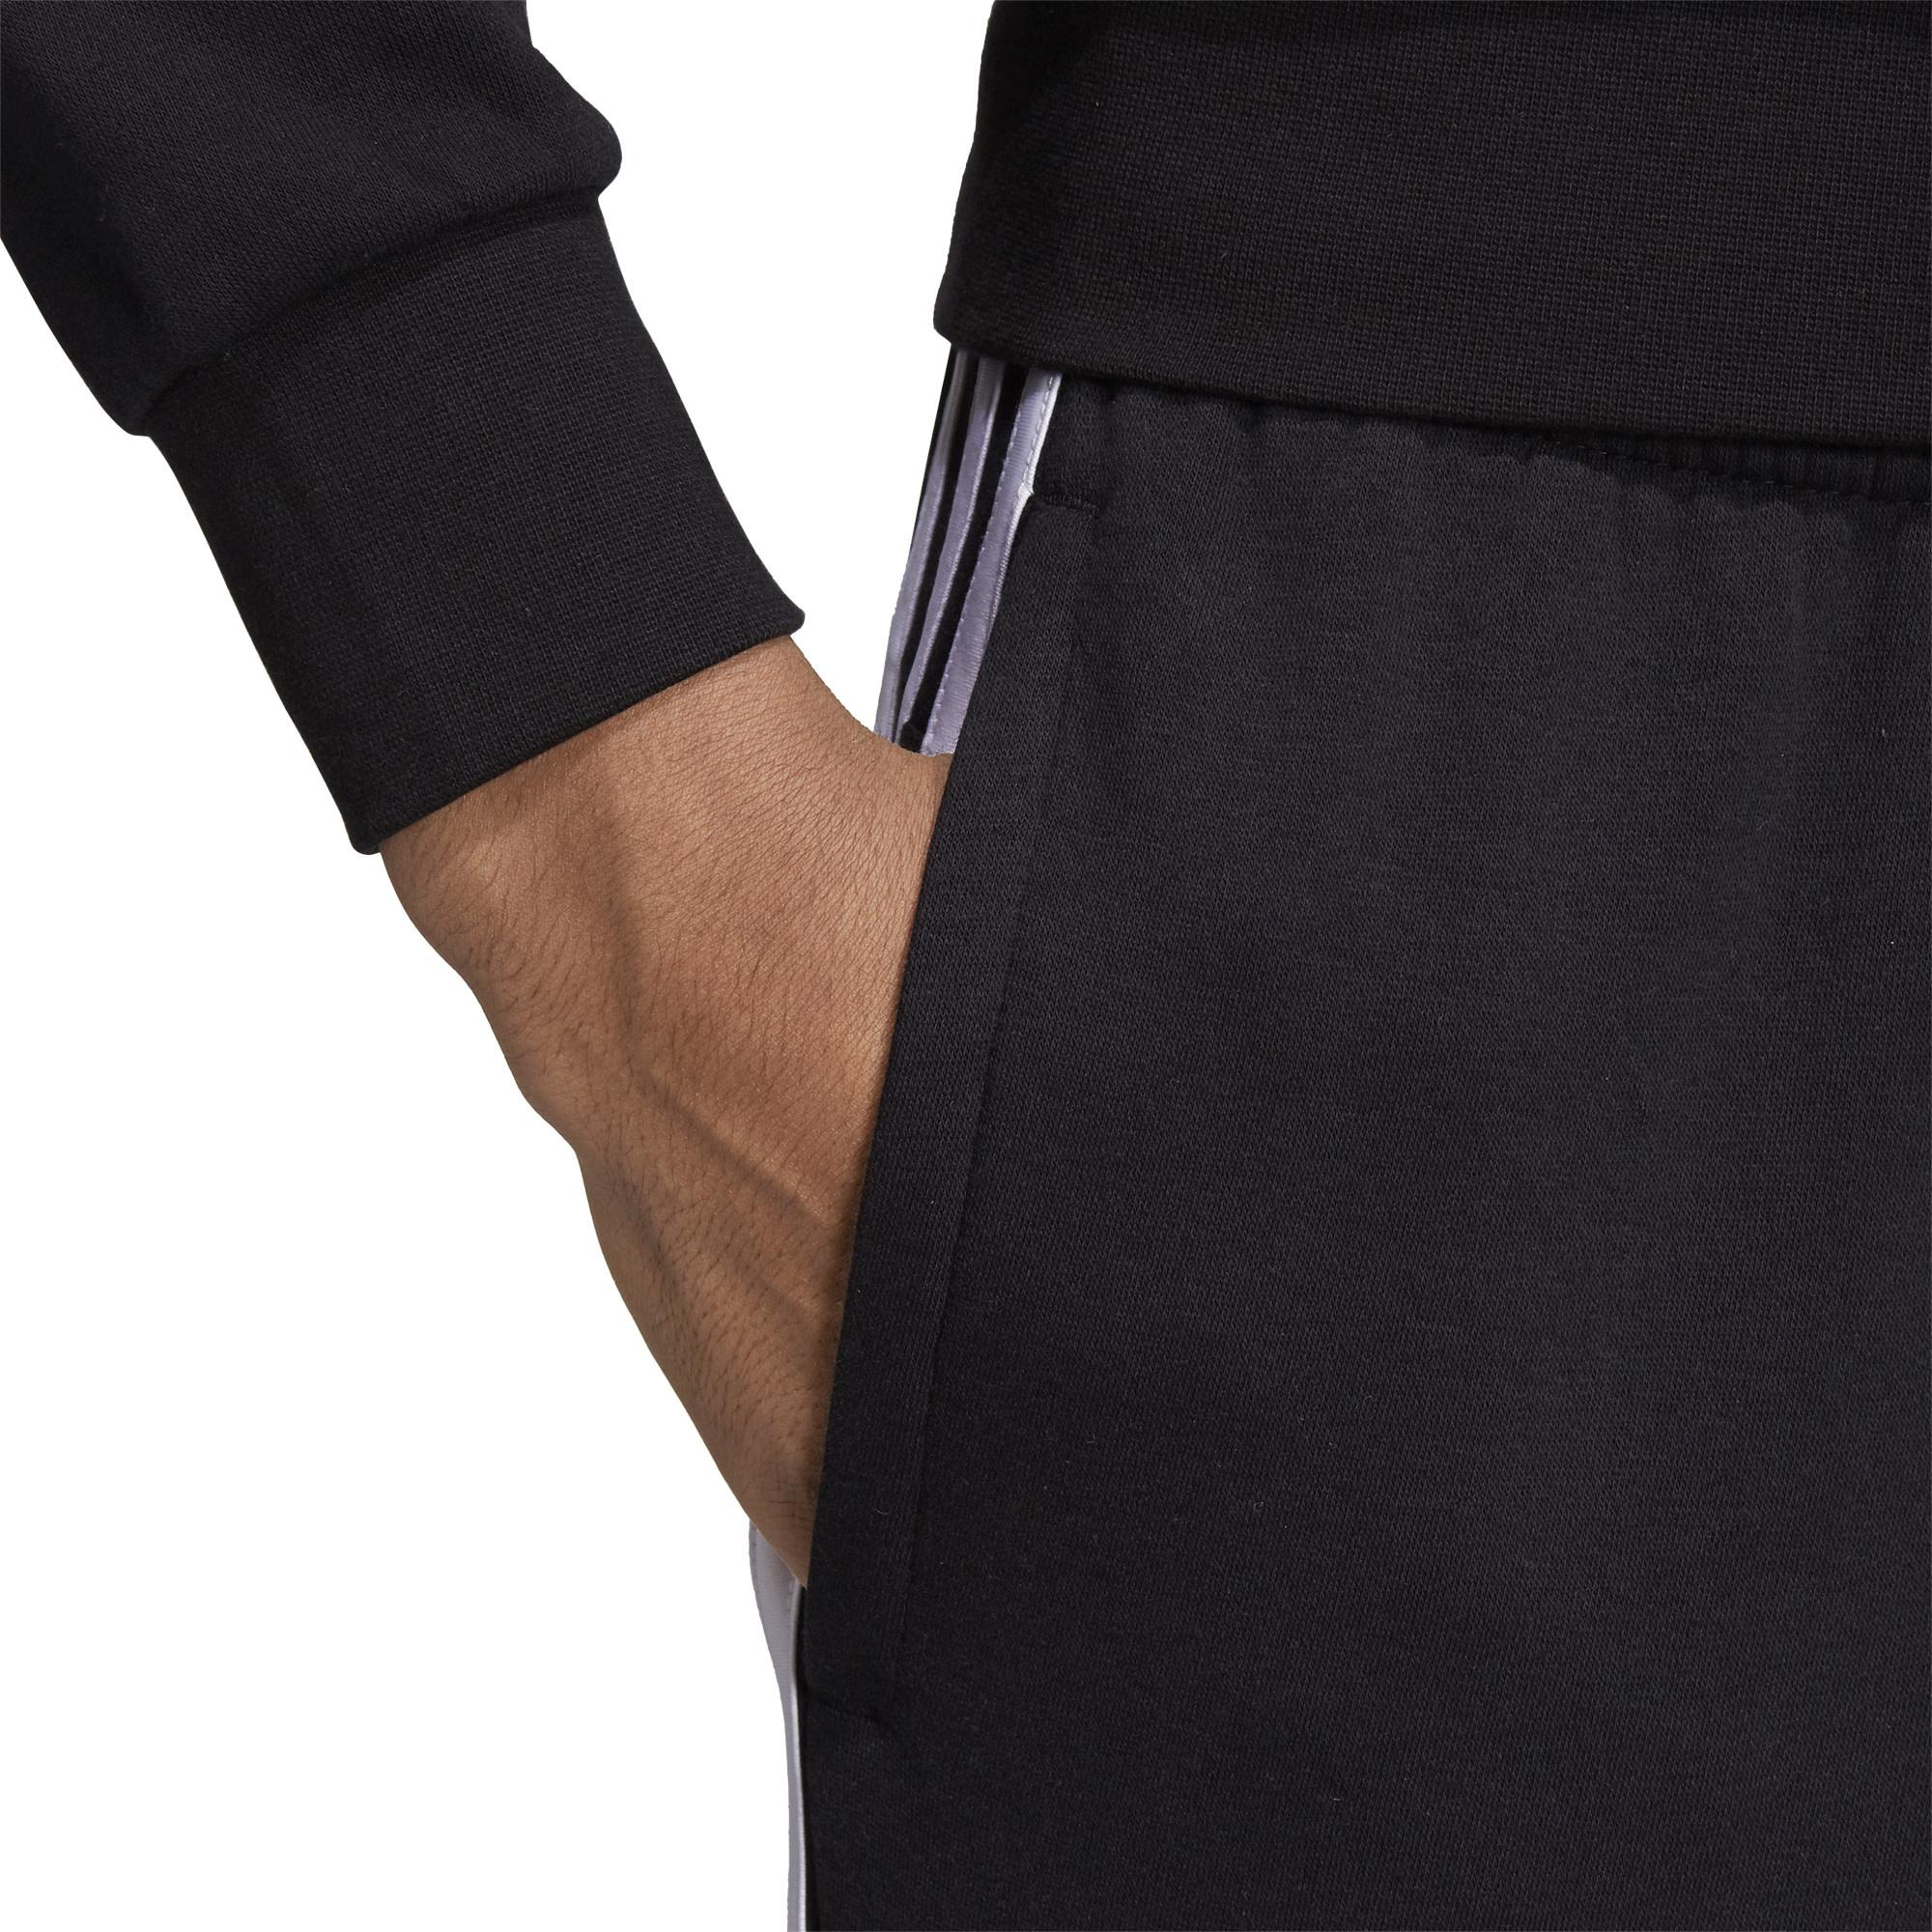 Adidas ADIDAS Essential 3S Pant